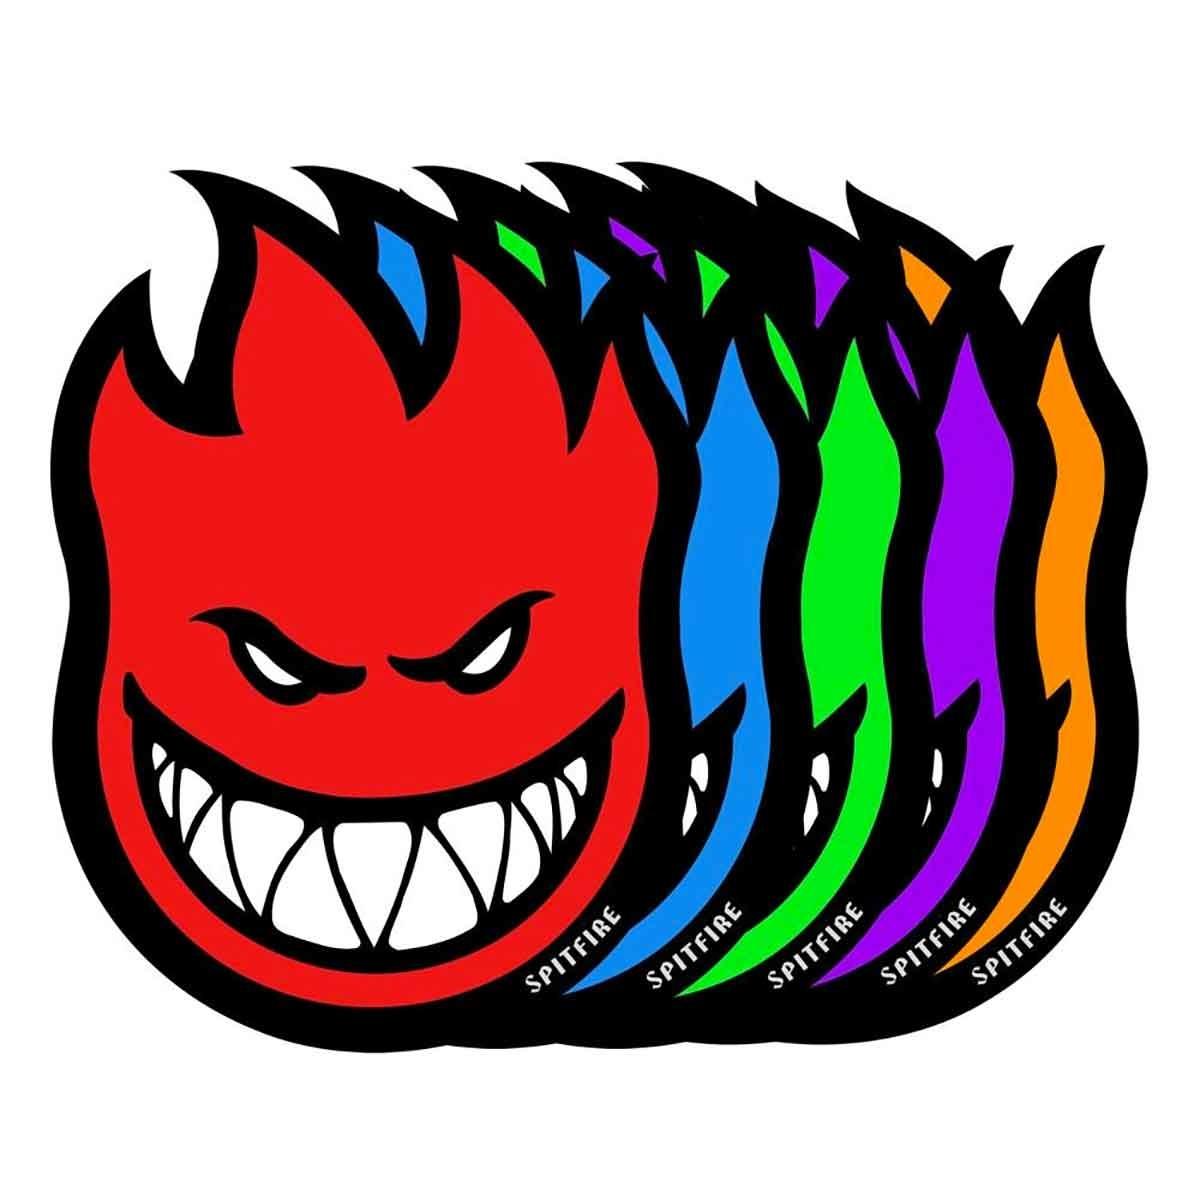 spitfire sf fireball 1.5in sticker